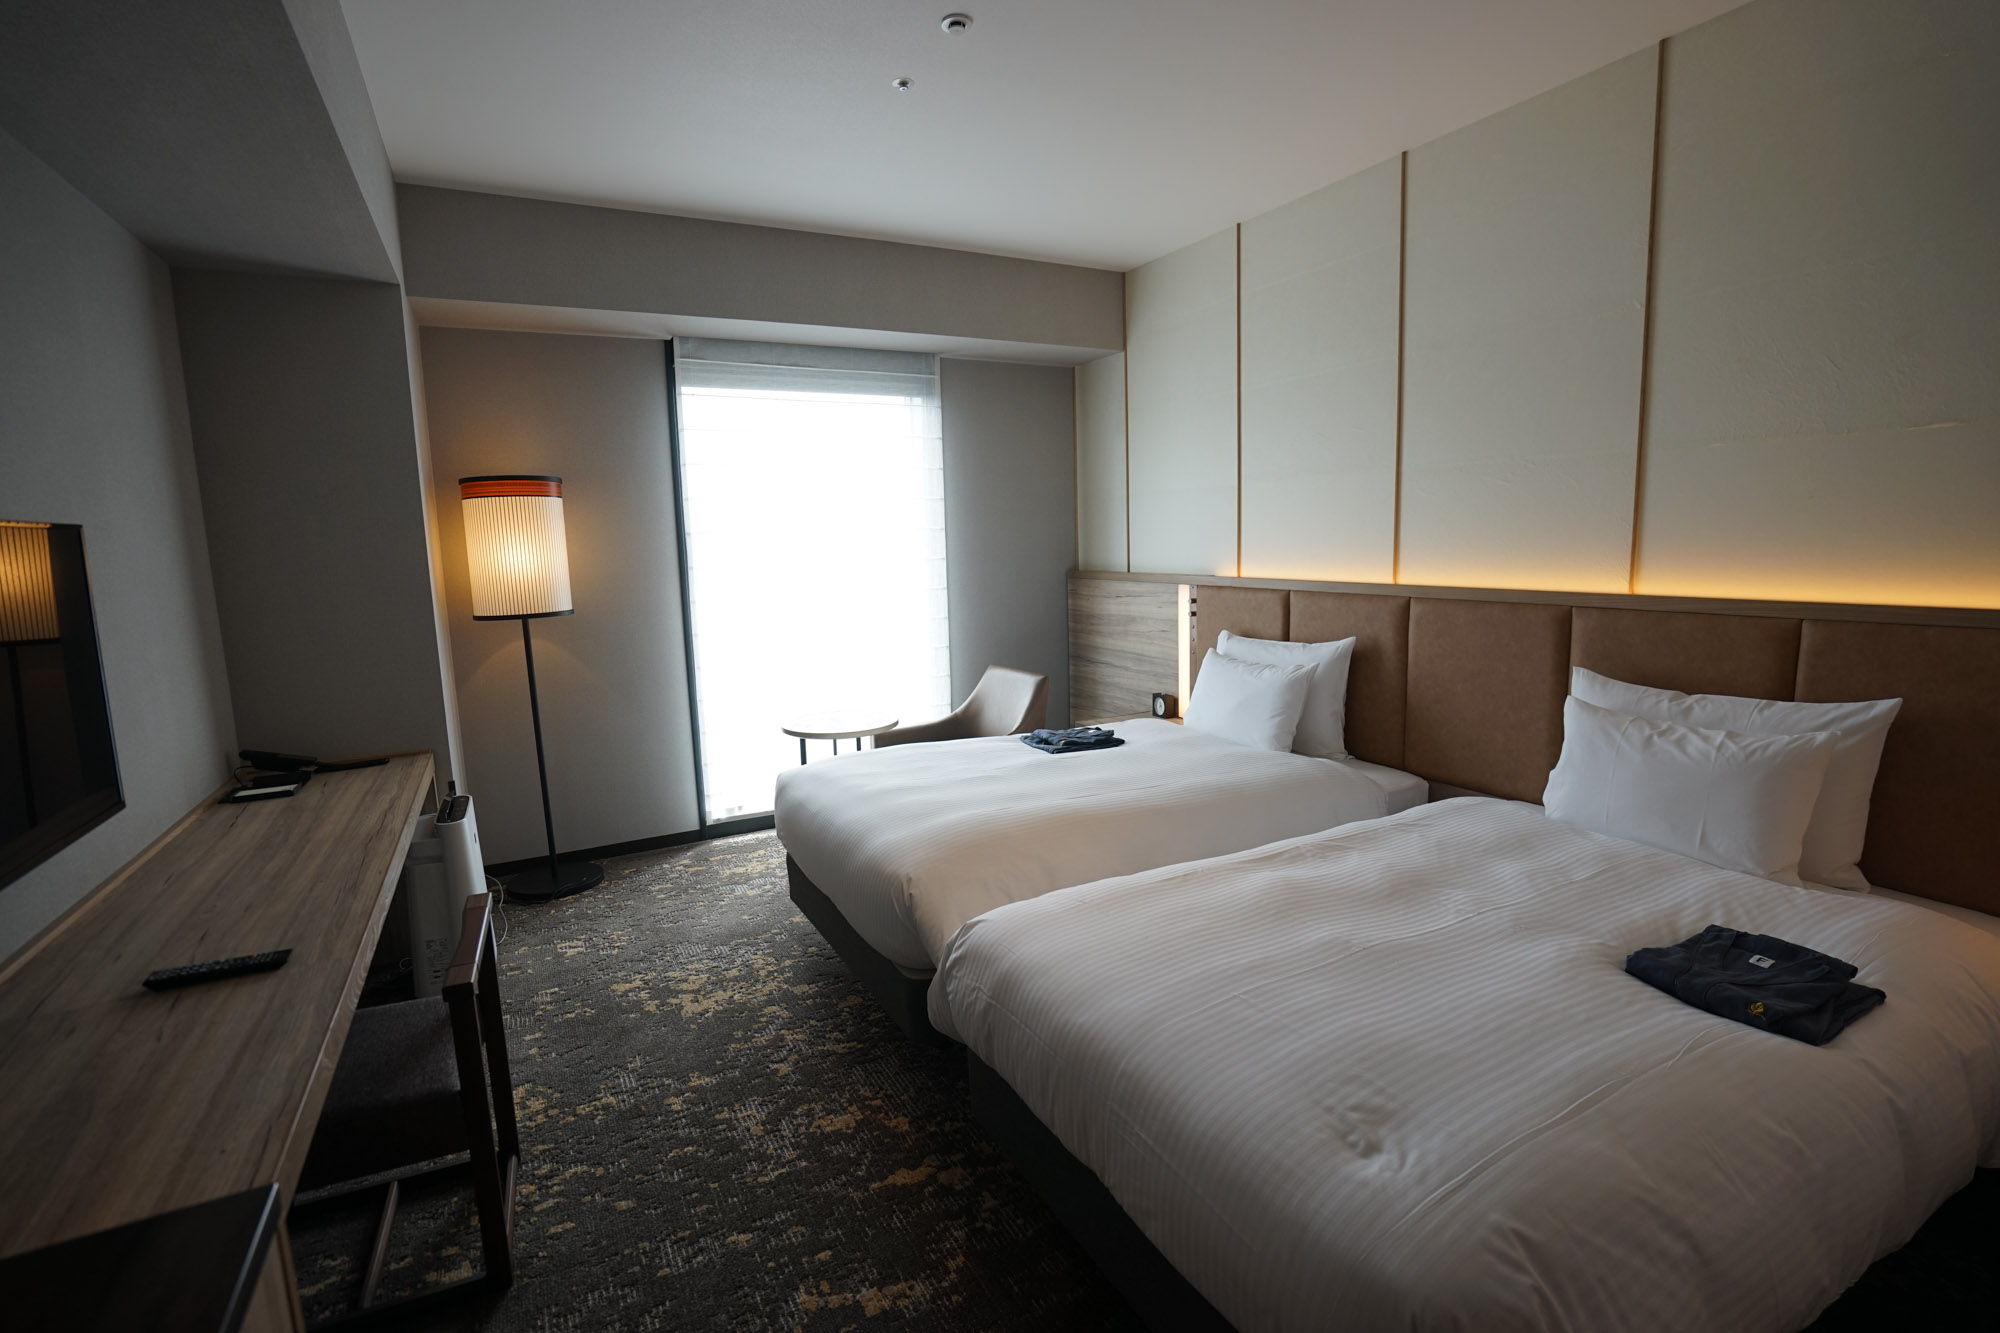 THE BLOSSOM HAKATA Premier 宿泊レビュー!博多駅徒歩7分、大浴場からフィットネスジムまで揃ったプレミアムな暮らしを日常に。